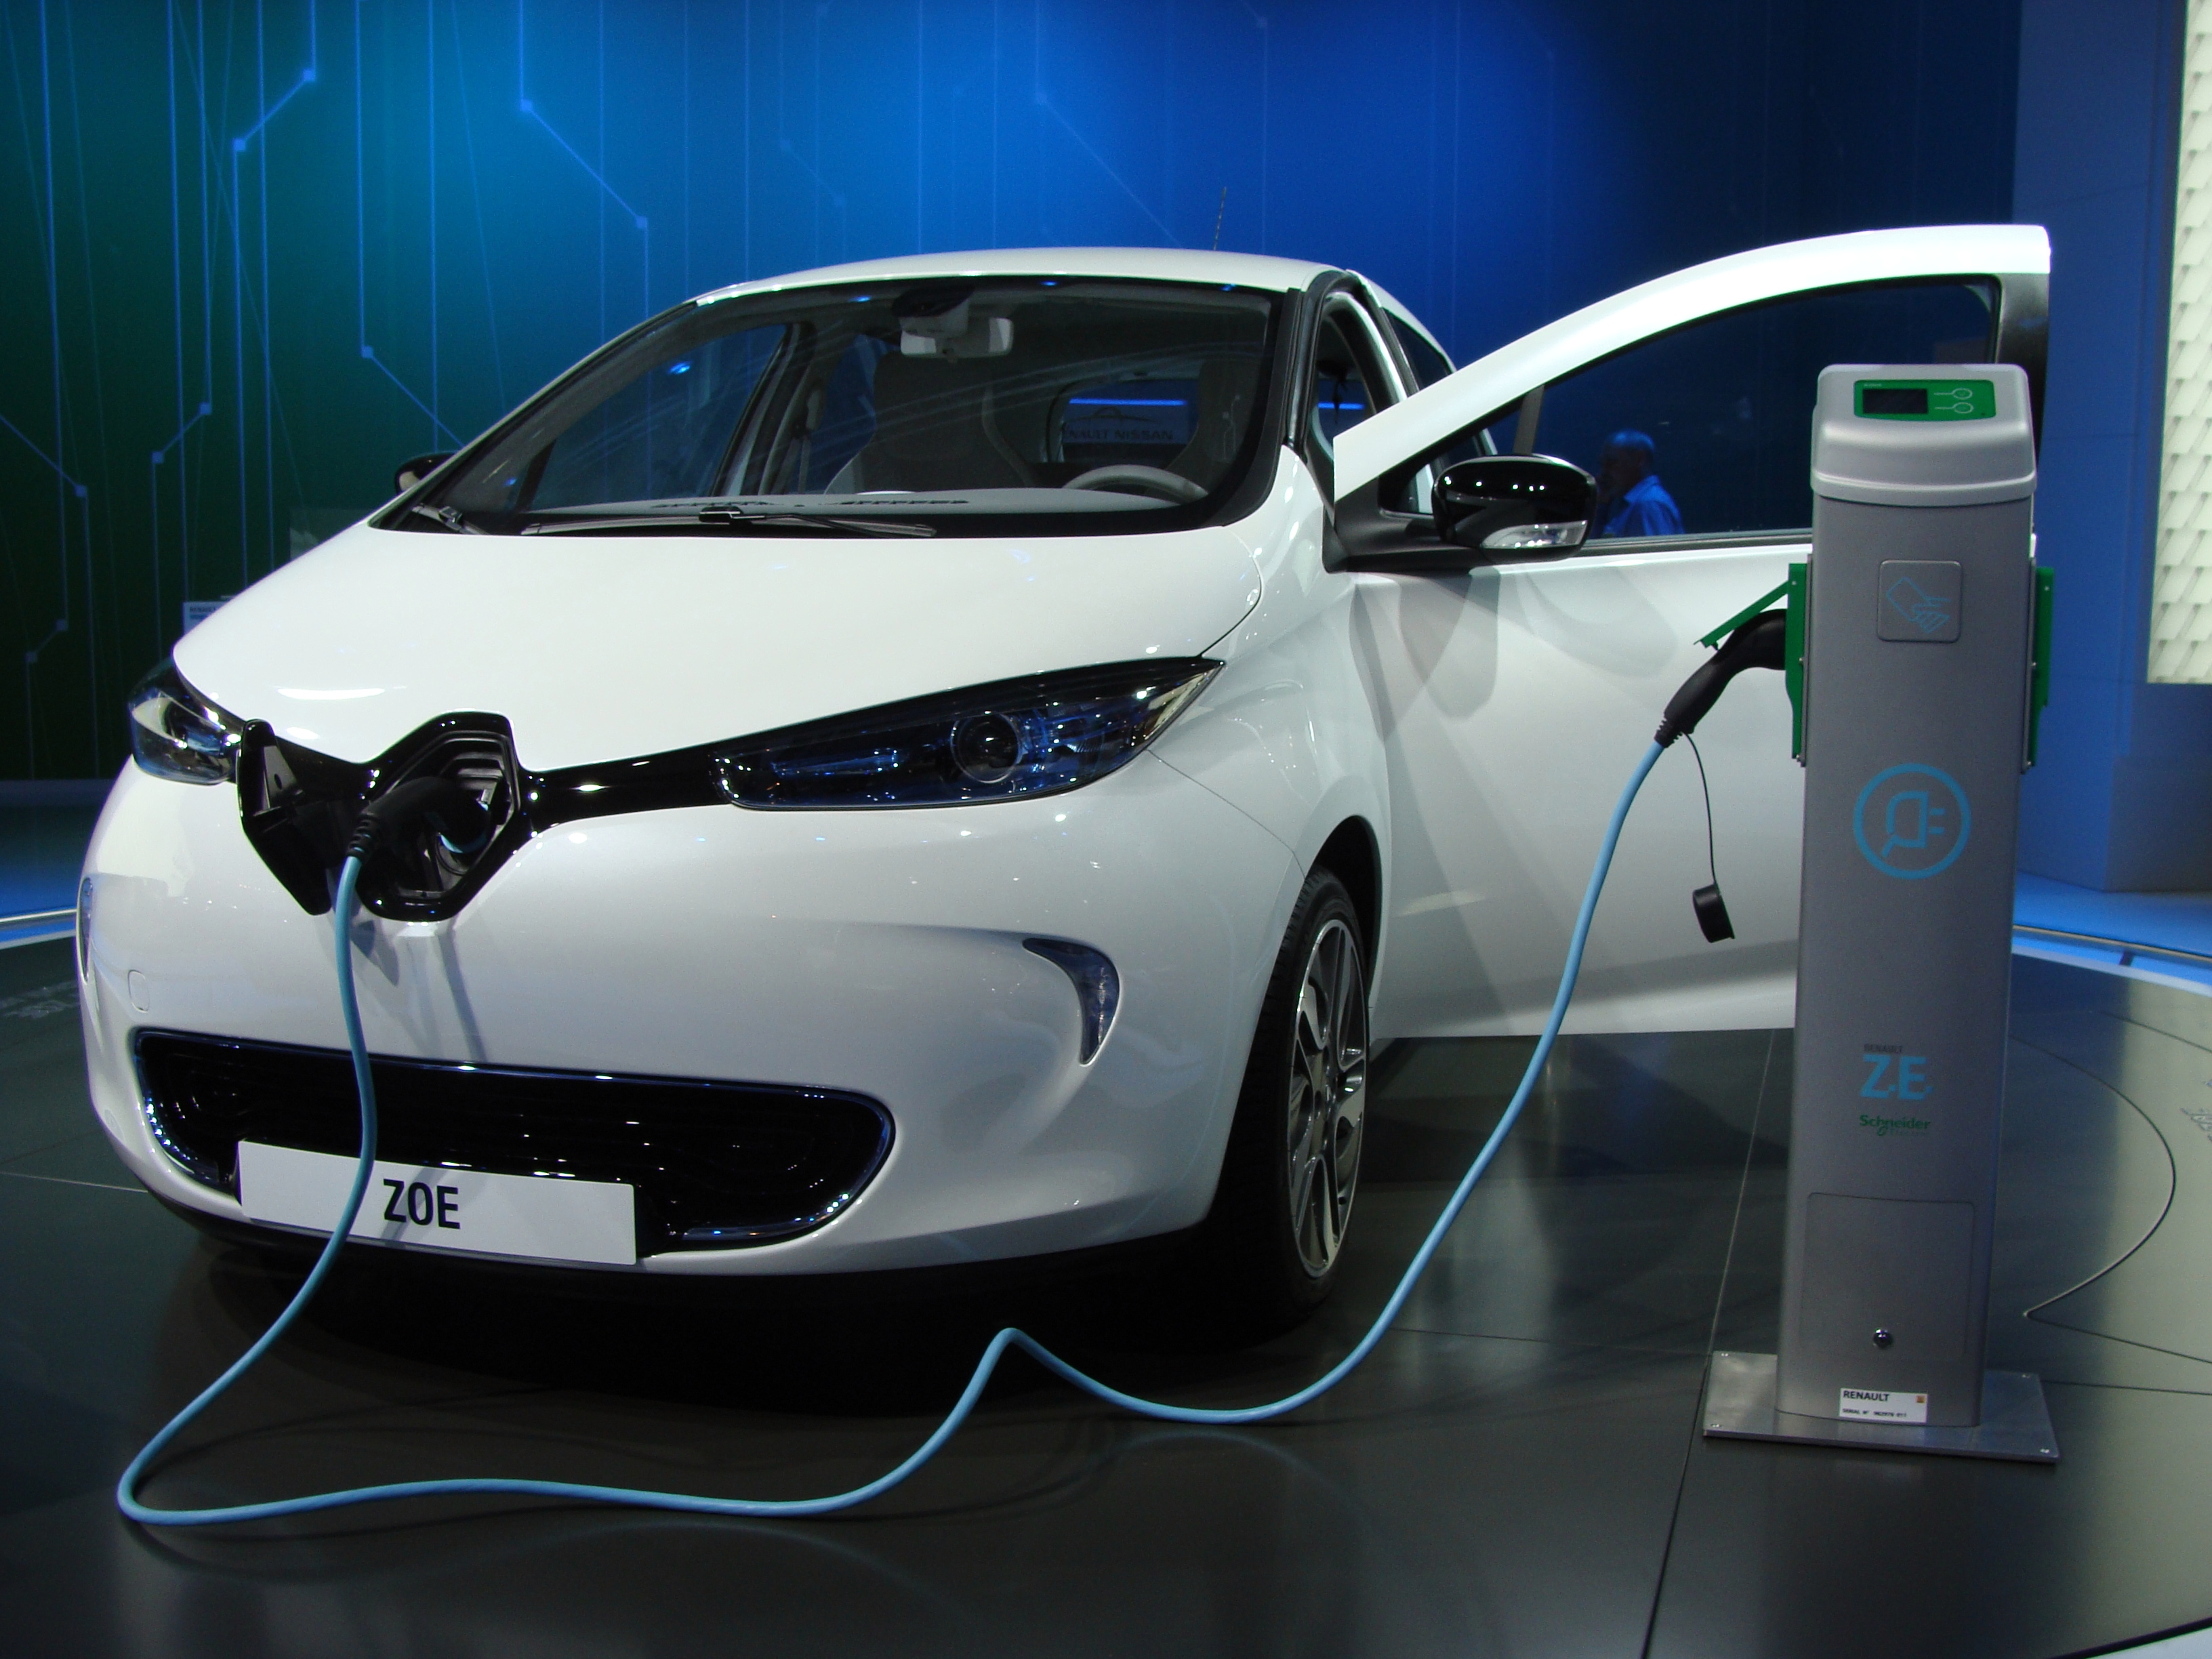 Renault_Zoe_on_MIAS_2012